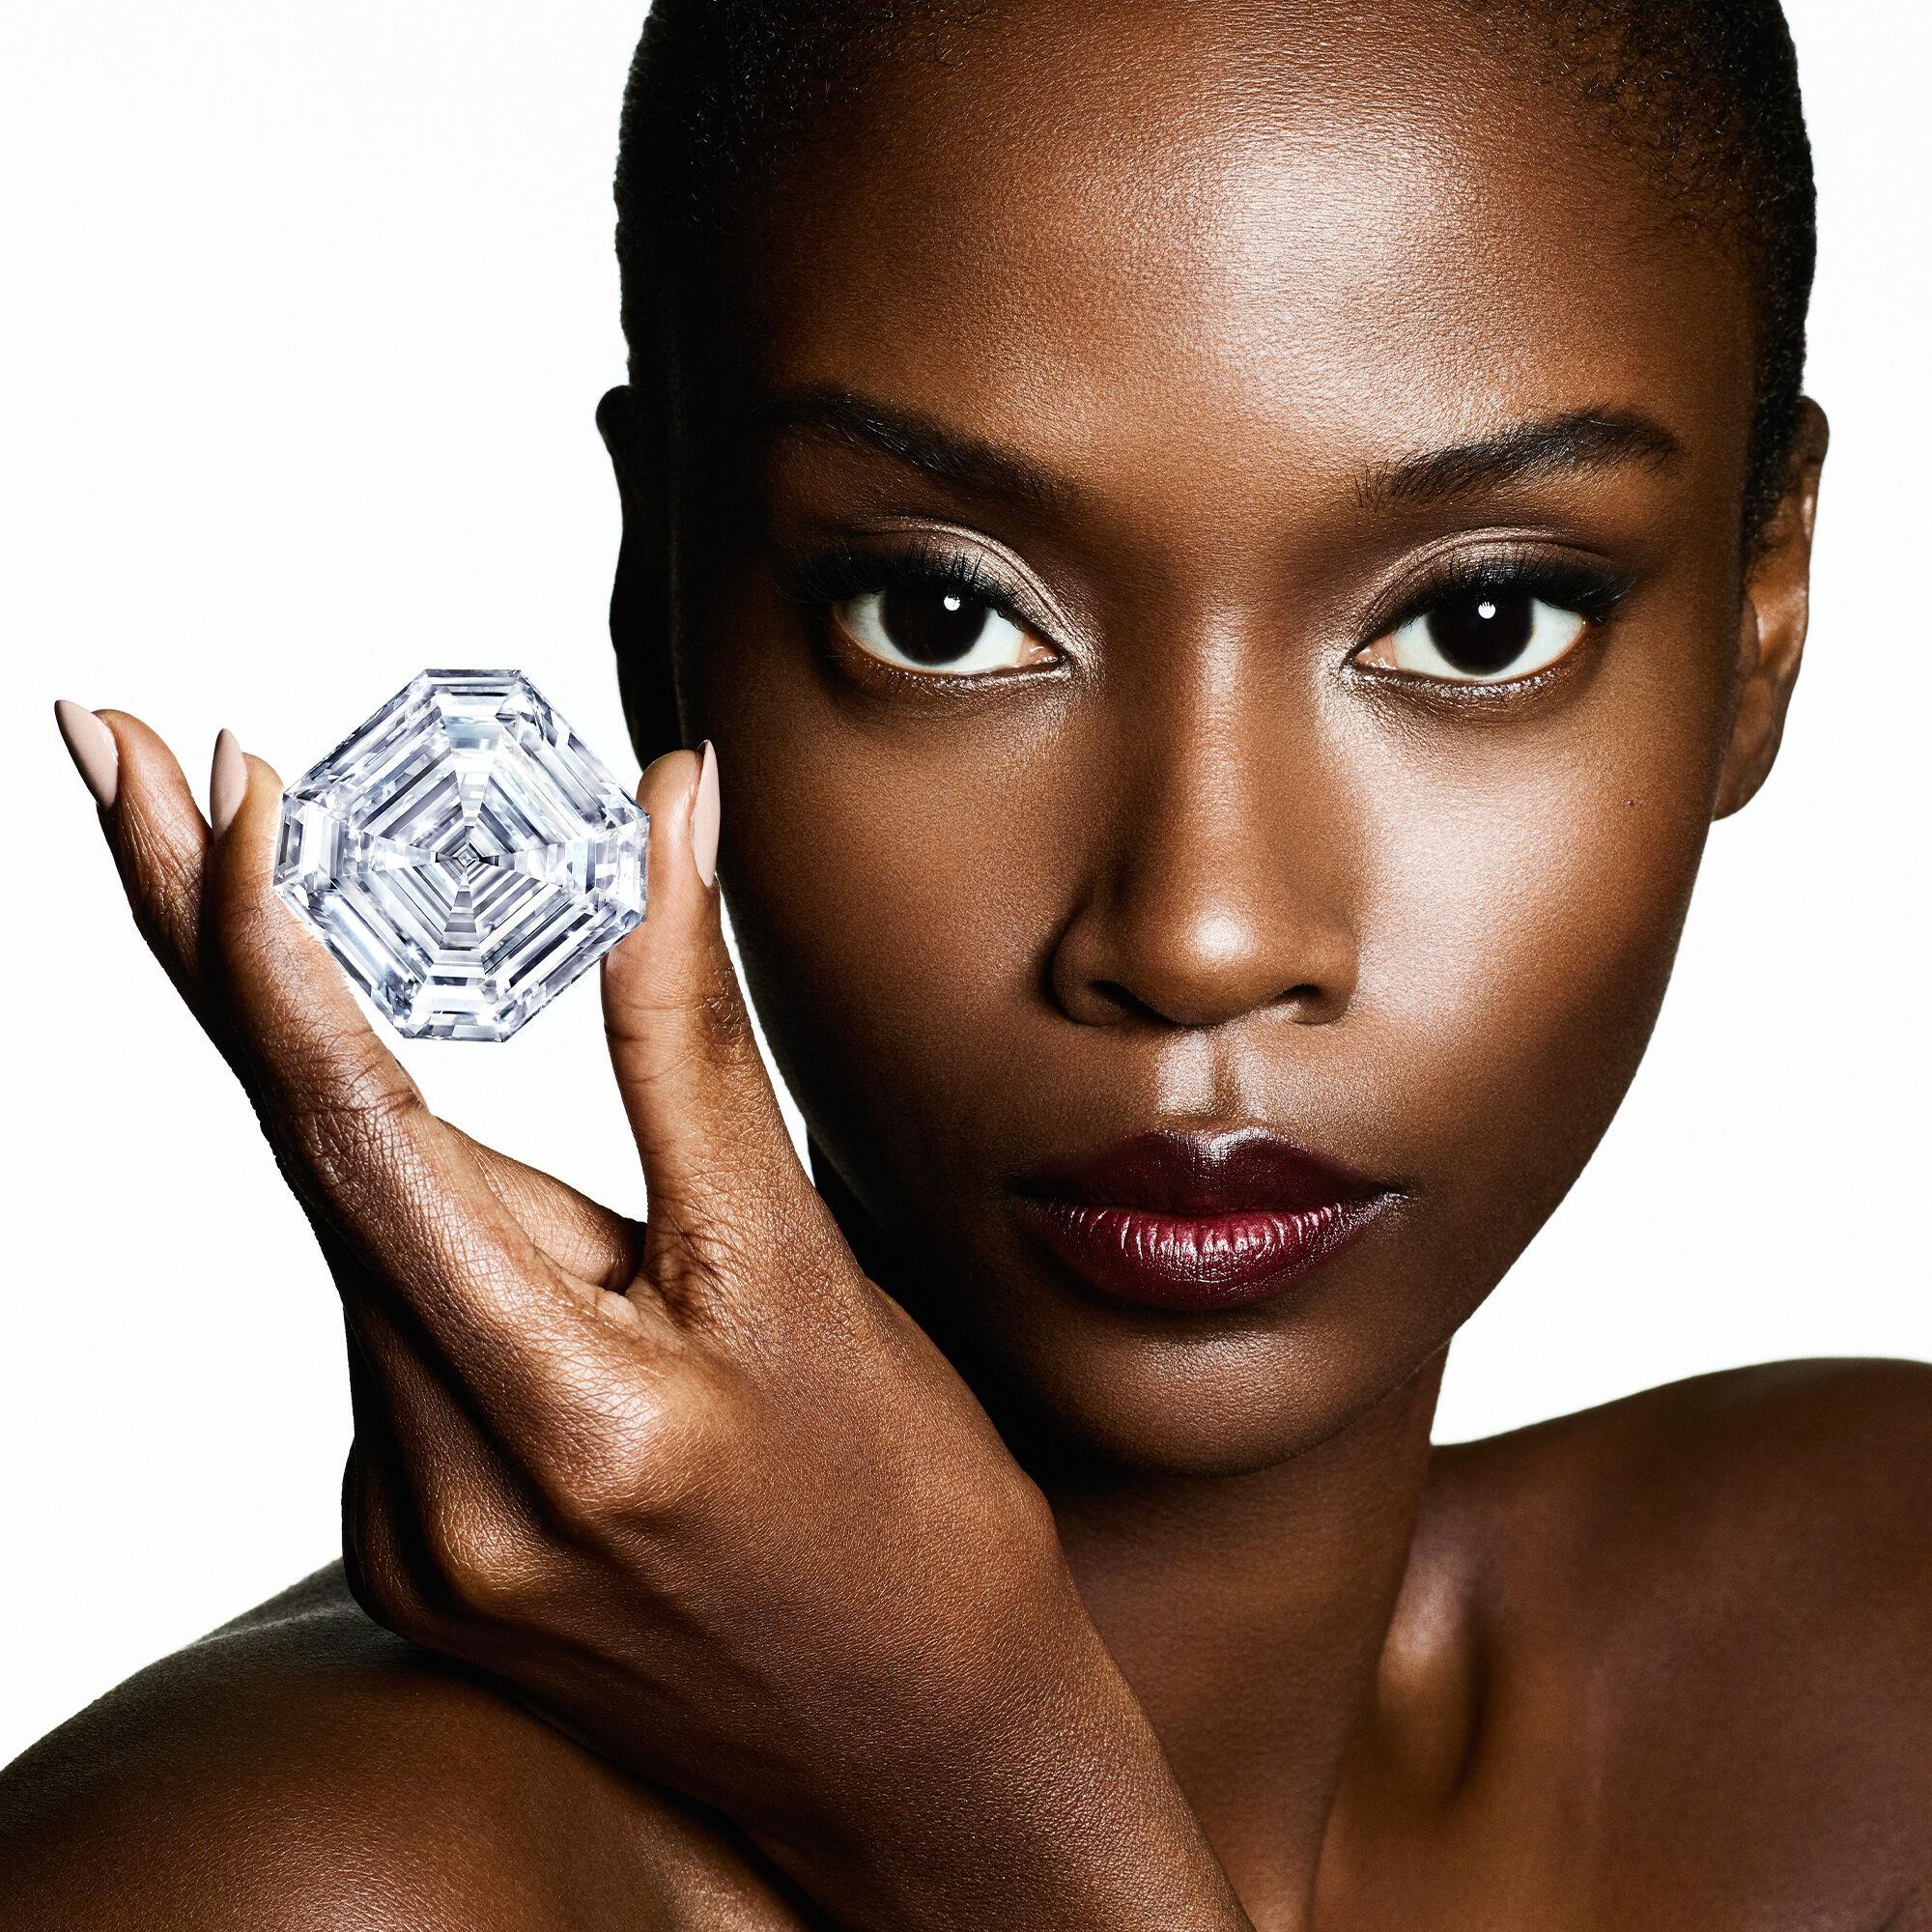 Model holding the Graff Lesedi La Rona famous diamond